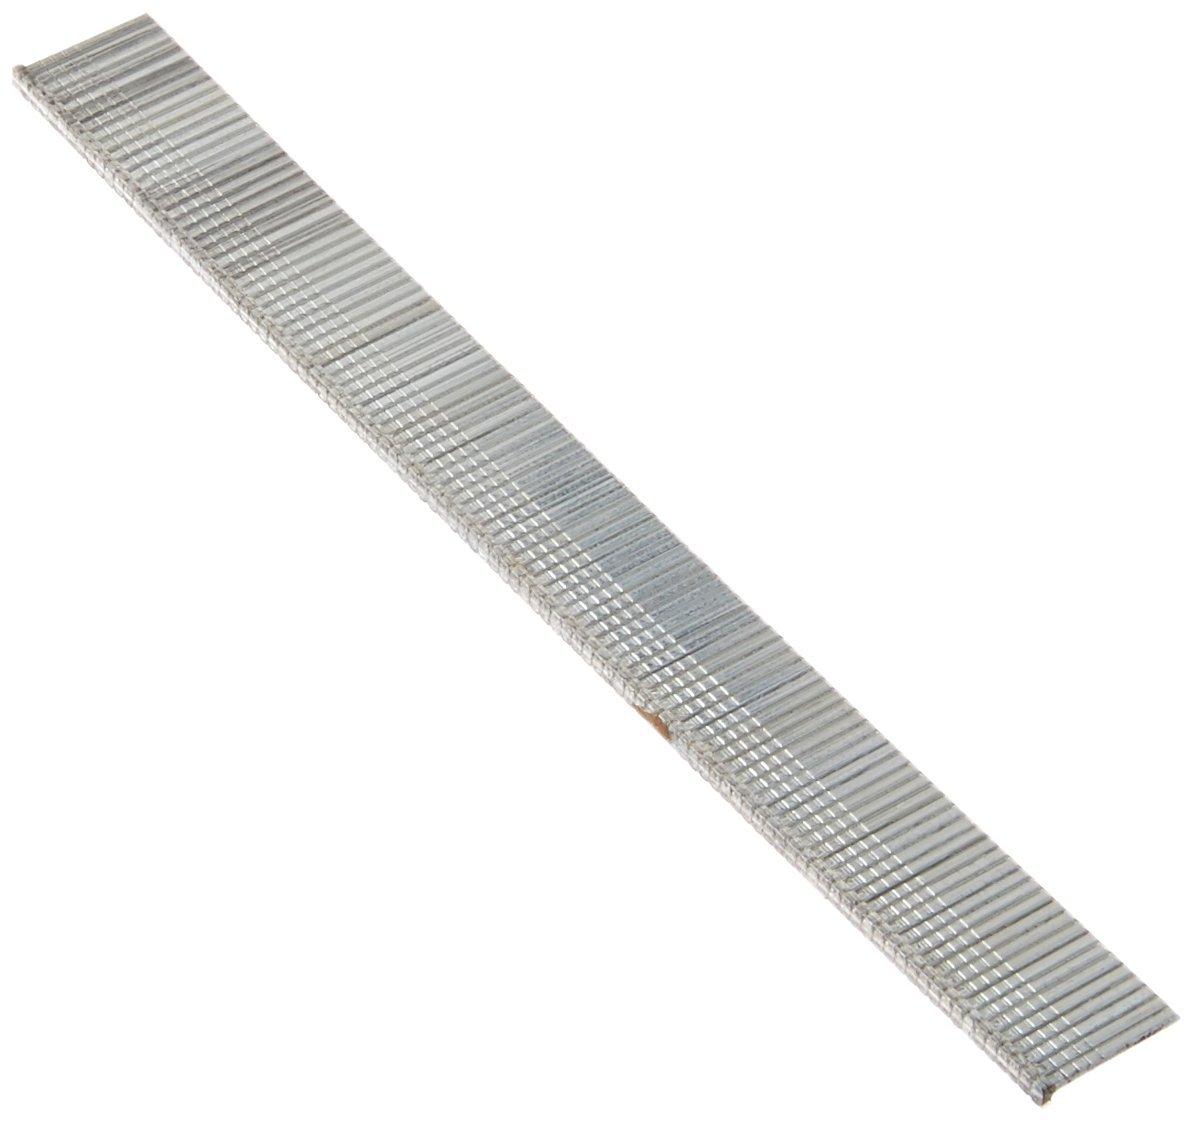 Stanley SWKBN050 1,000 Units 1/2-Inch Brad Nails